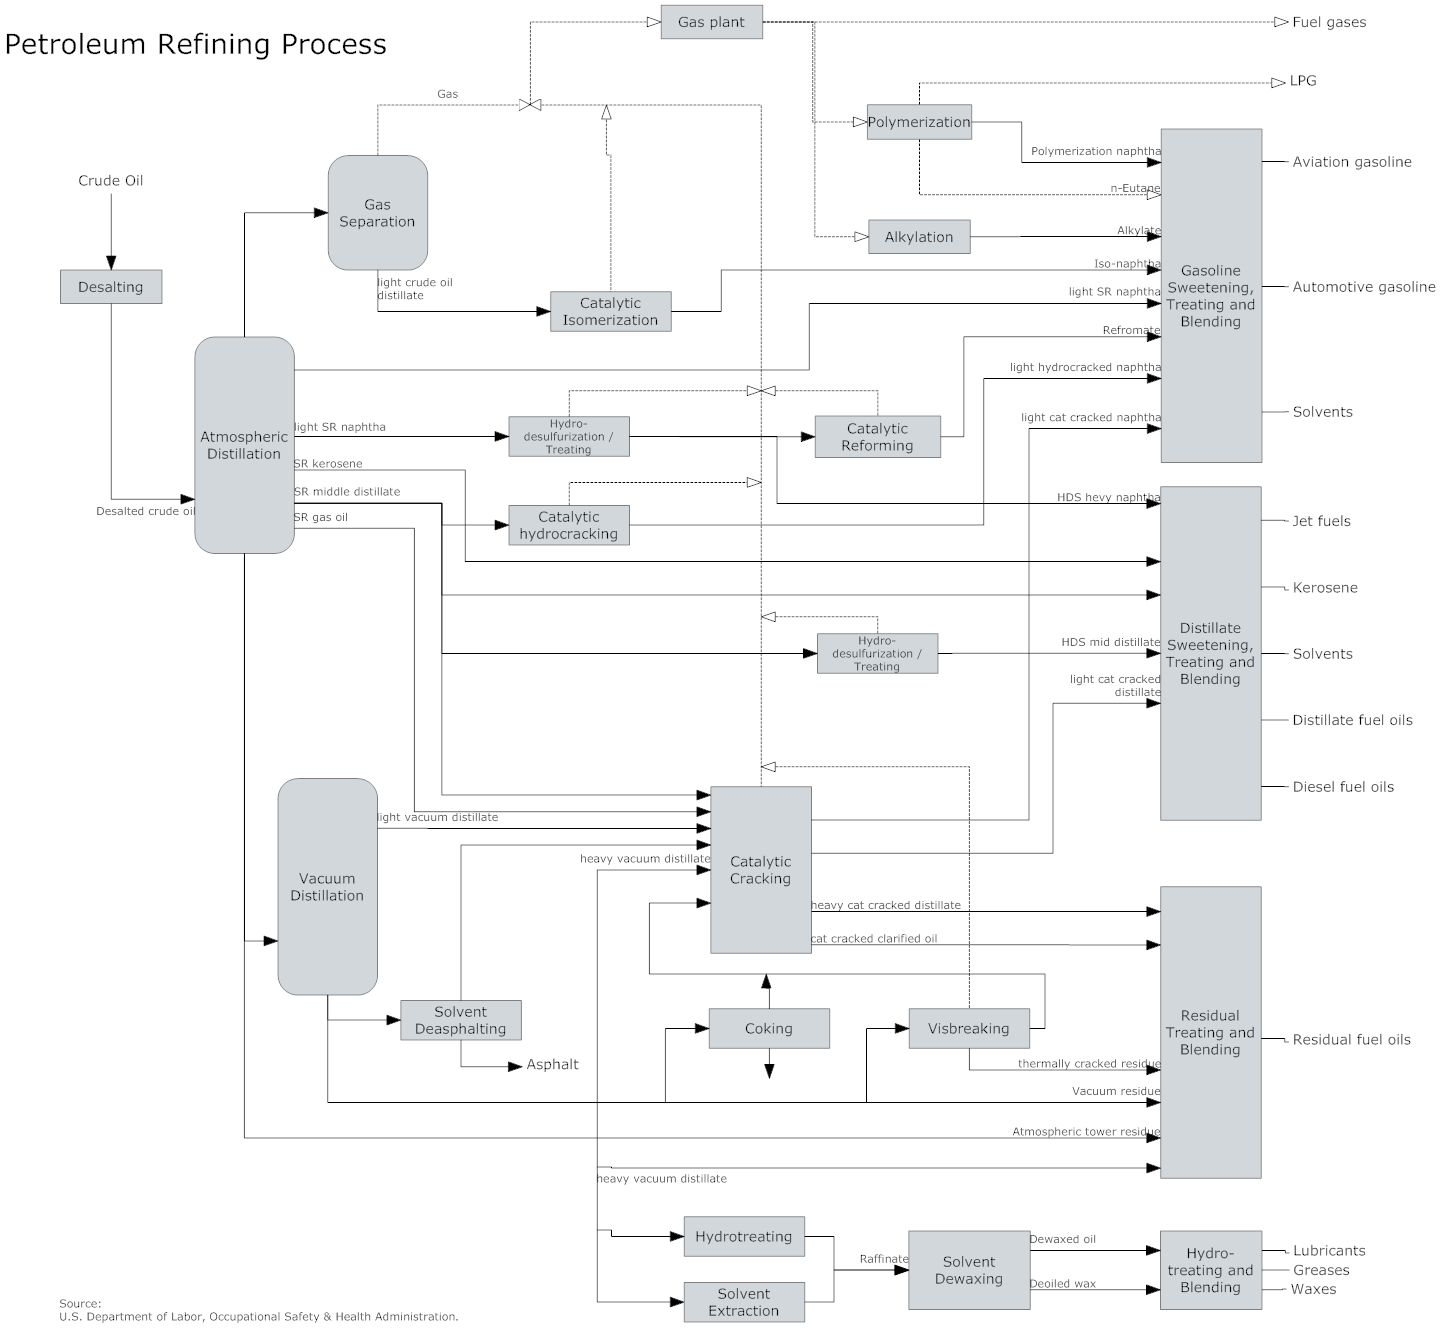 process flow diagram software free process flow diagram pfd templatesProcess Flow Diagram Images Free #4